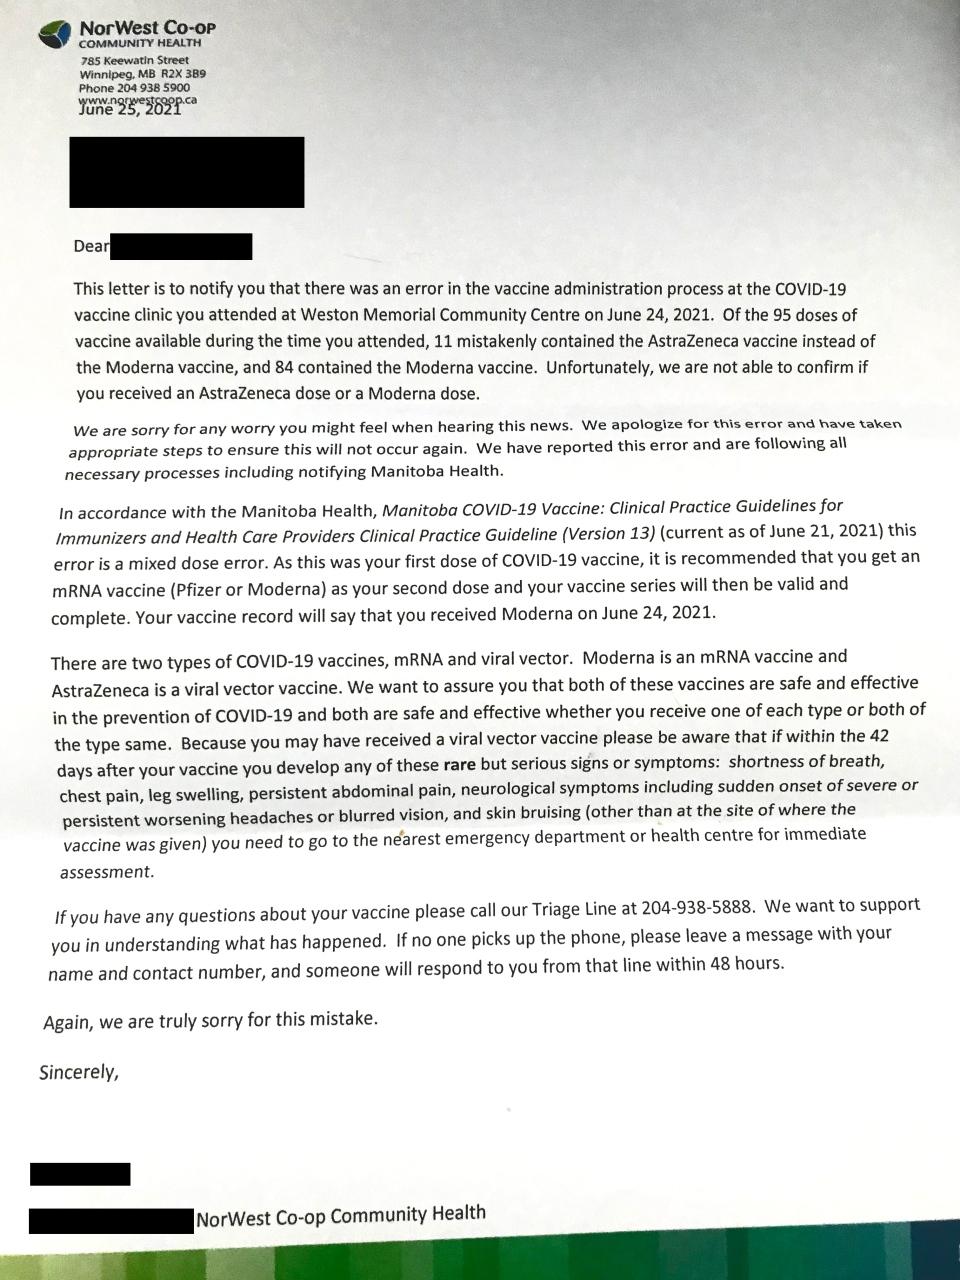 NorWest Co-op Community Health letter